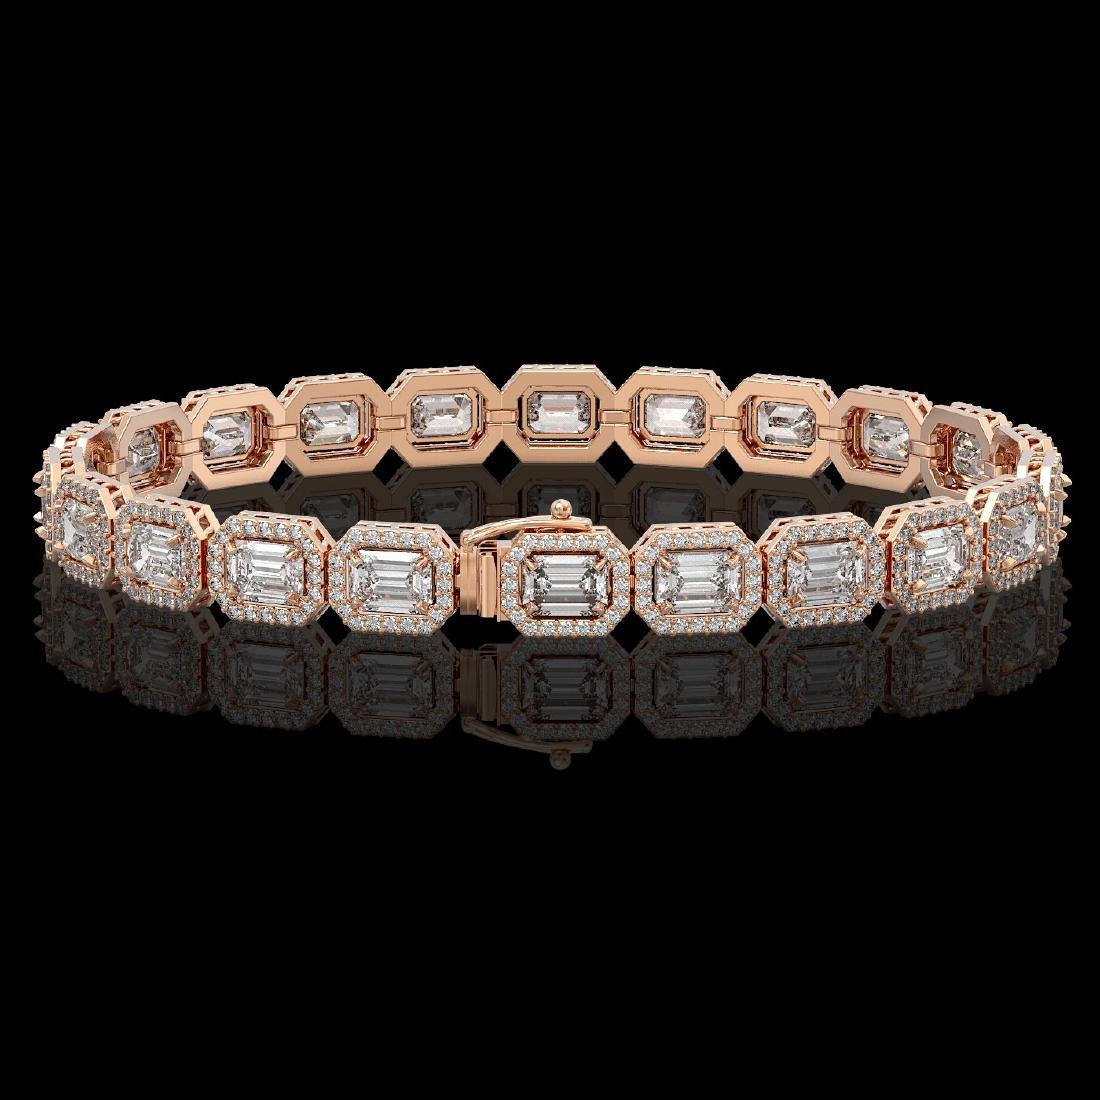 14.57 CTW Emerald Cut Diamond Designer Bracelet 18K - 2